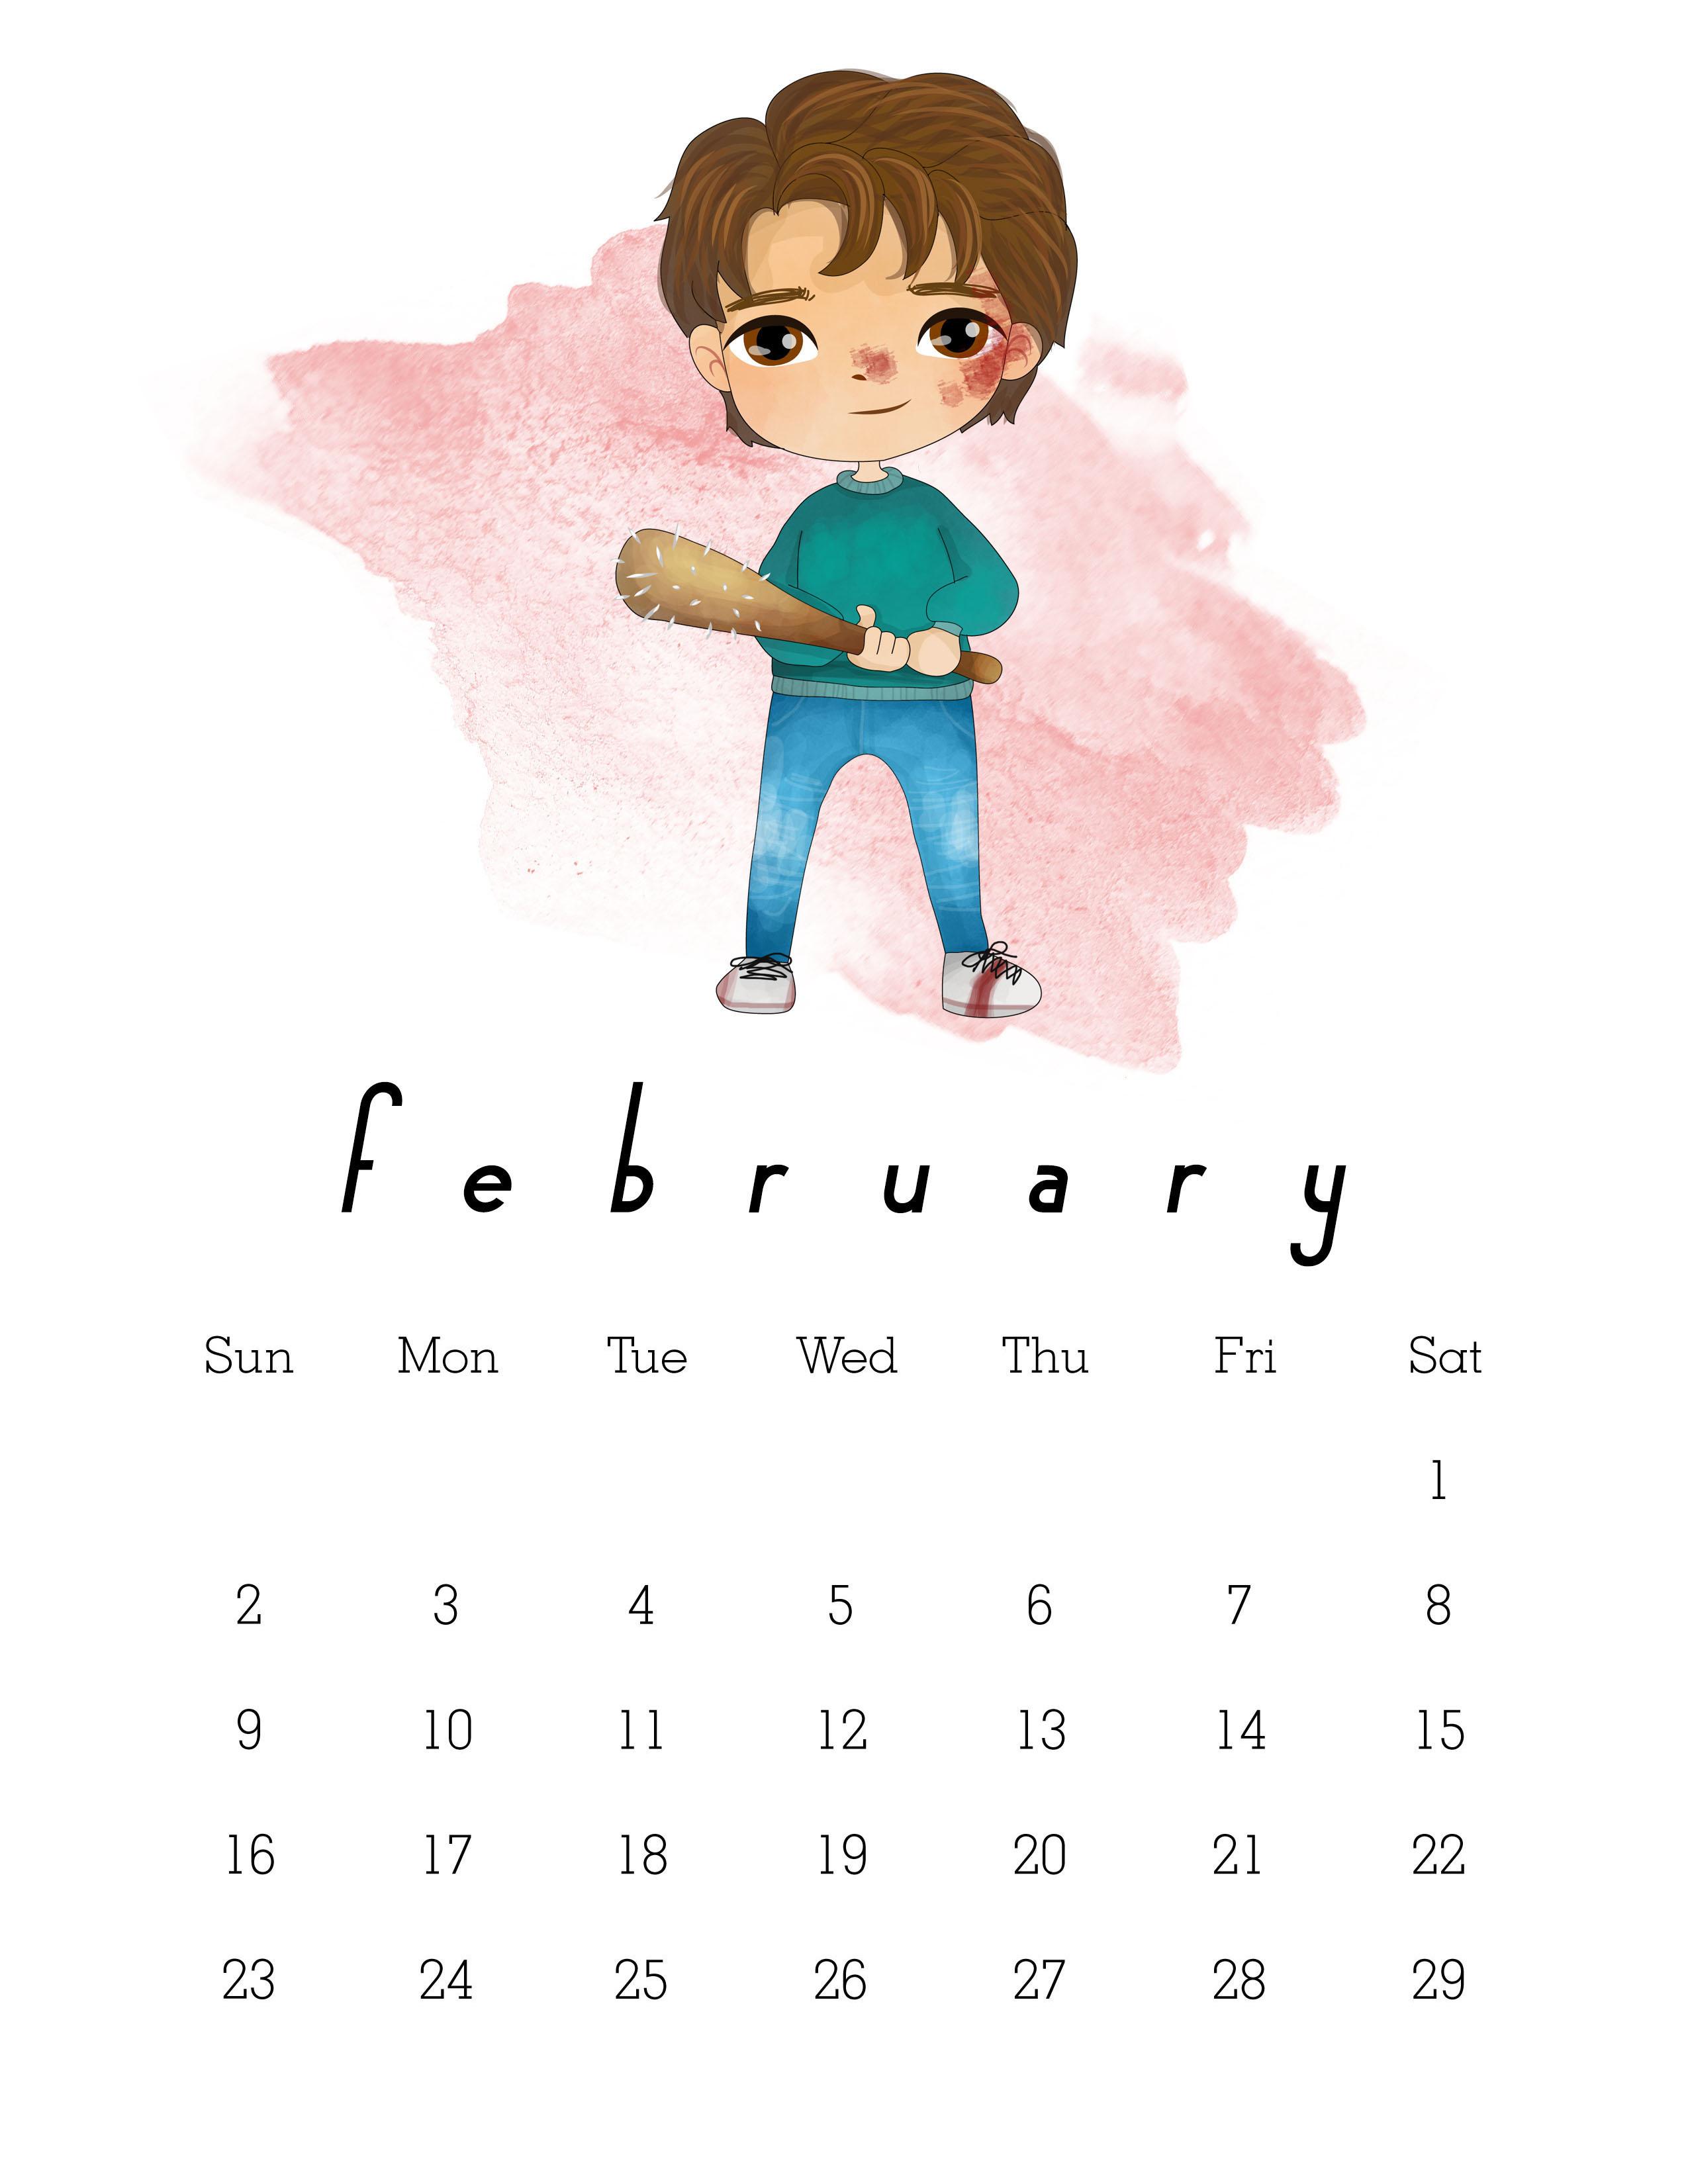 Free Printable 2020 Stranger Things Calendar - The Cottage